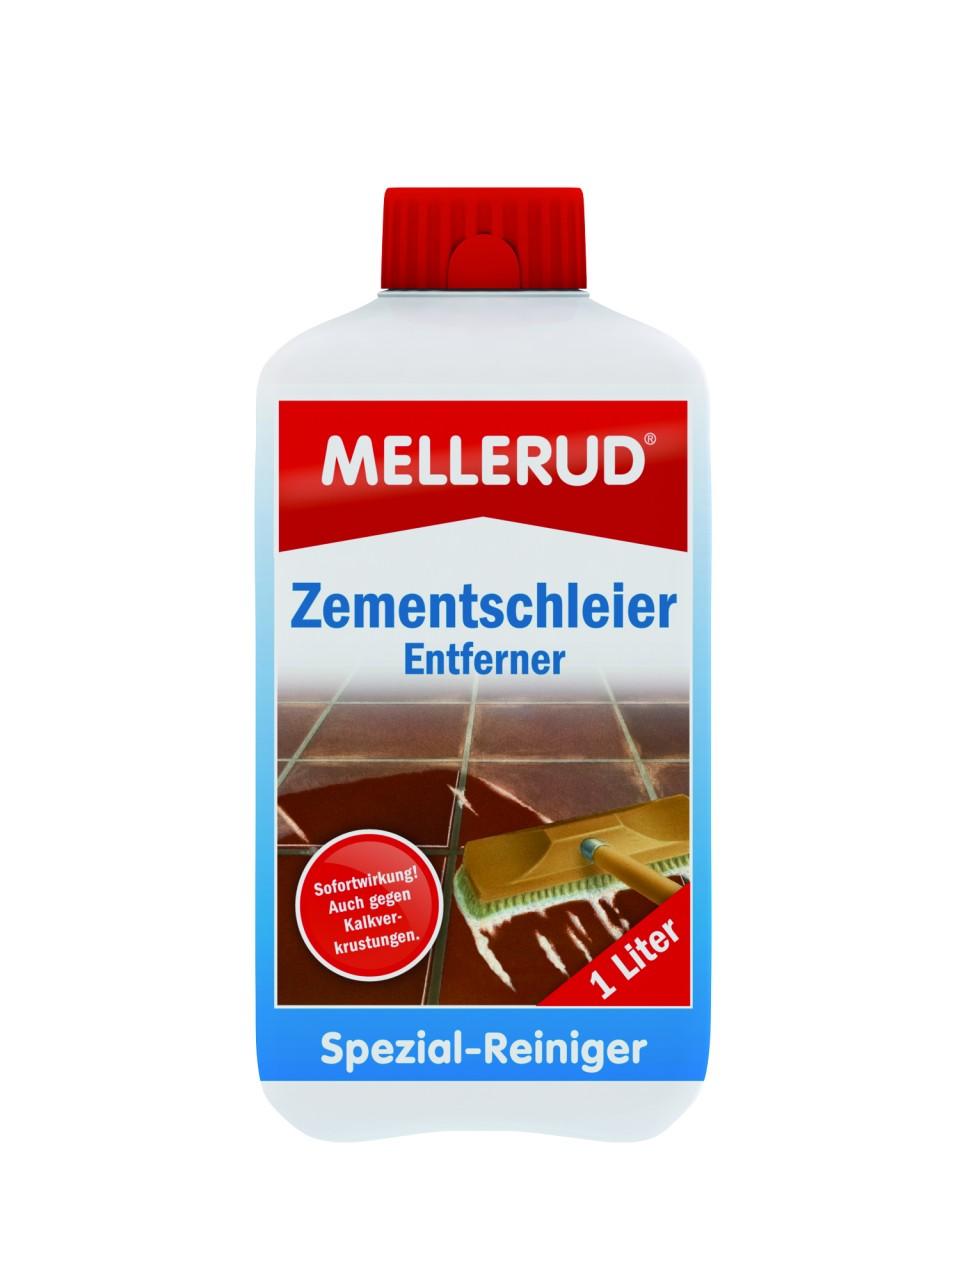 MELLERUD Zementschleier Entferner 1,0 l